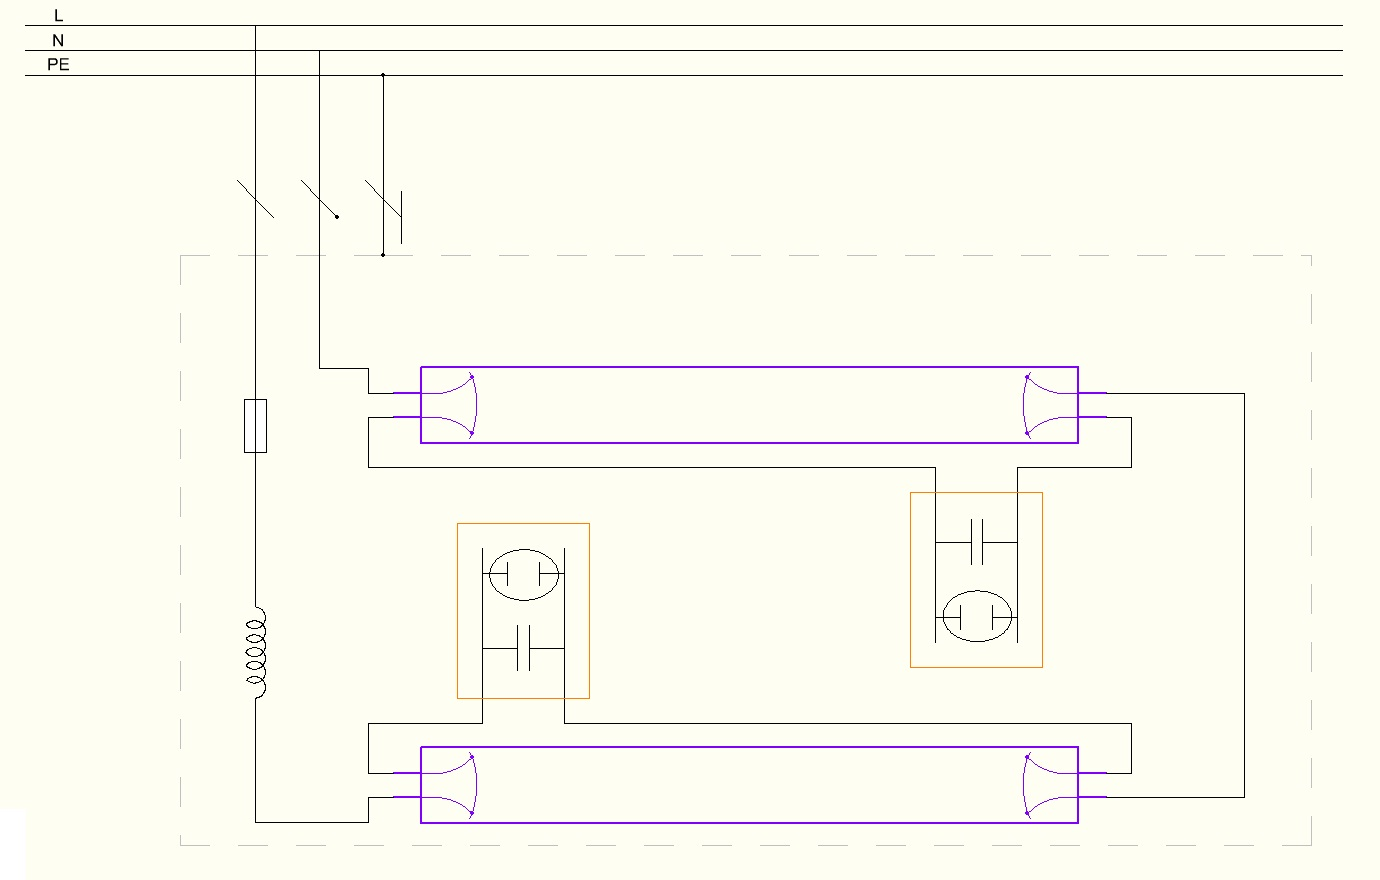 t8 2 lamp wiring diagram gt 8498  2 lamp t12 ballast wiring diagram wiring diagram  gt 8498  2 lamp t12 ballast wiring